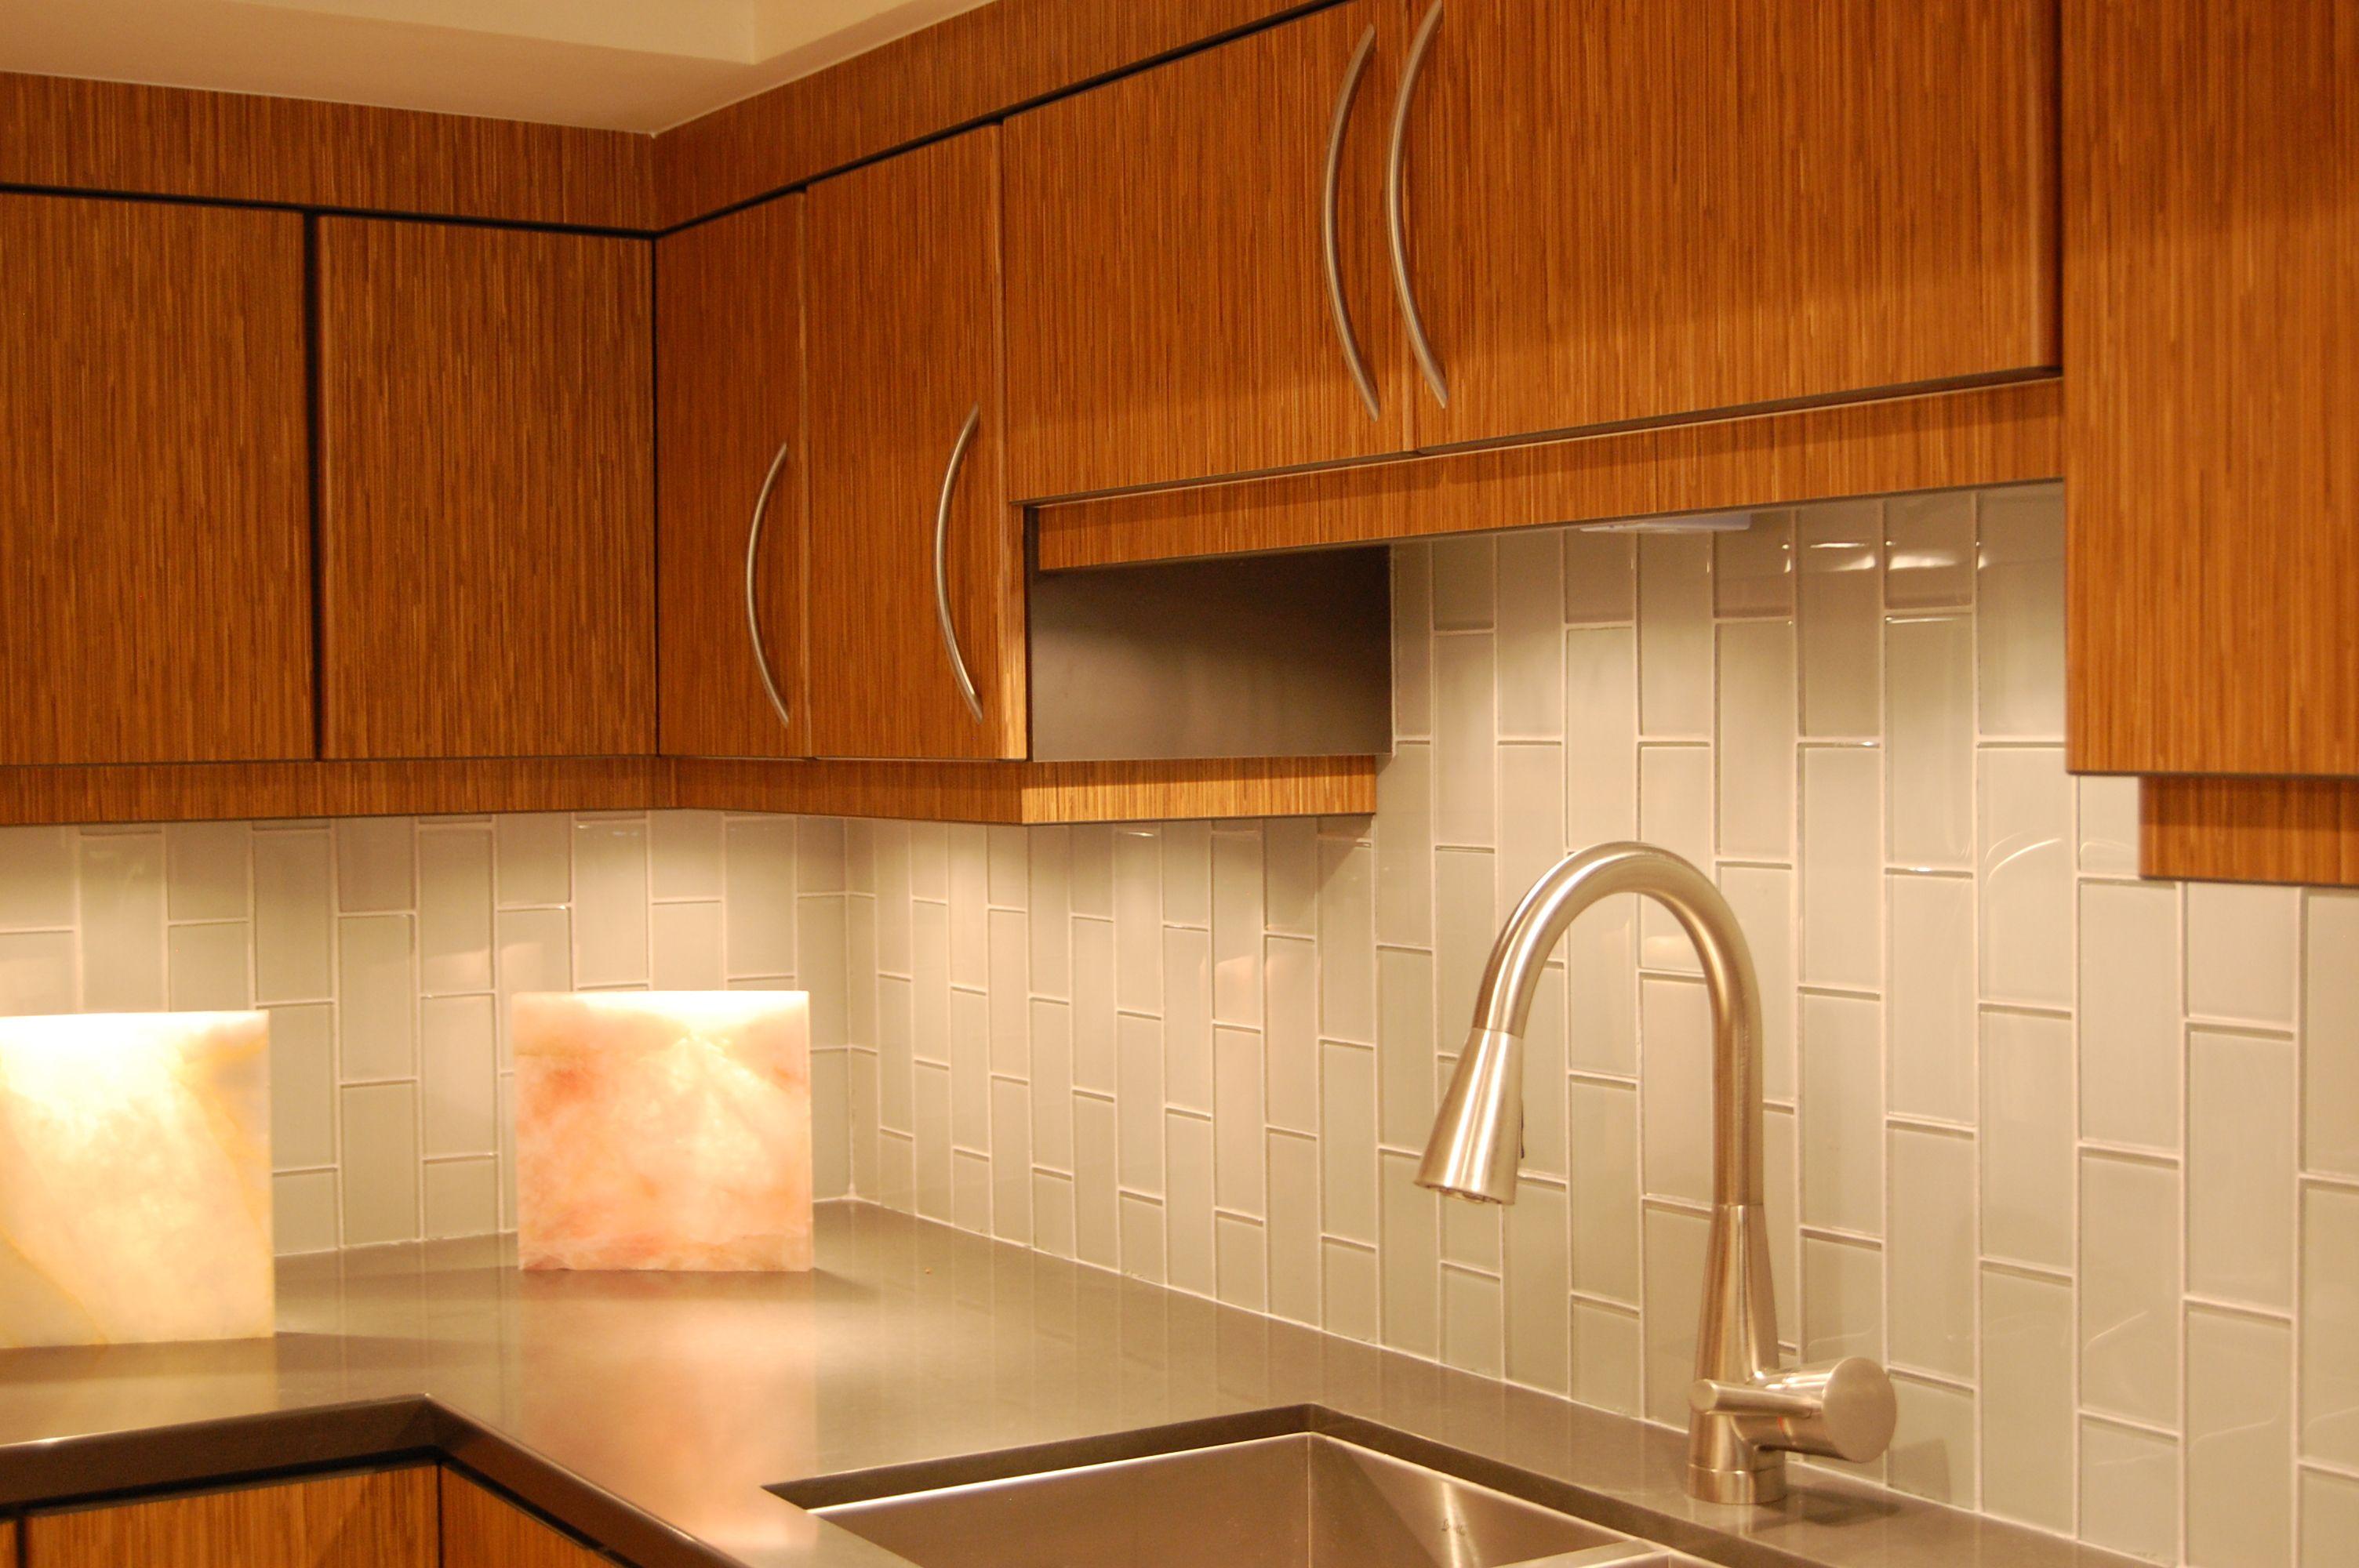 Kitchen Backsplash Glass on Pinterest  Kitchen Backsplash Glass Tiles and Kitchen Tiles